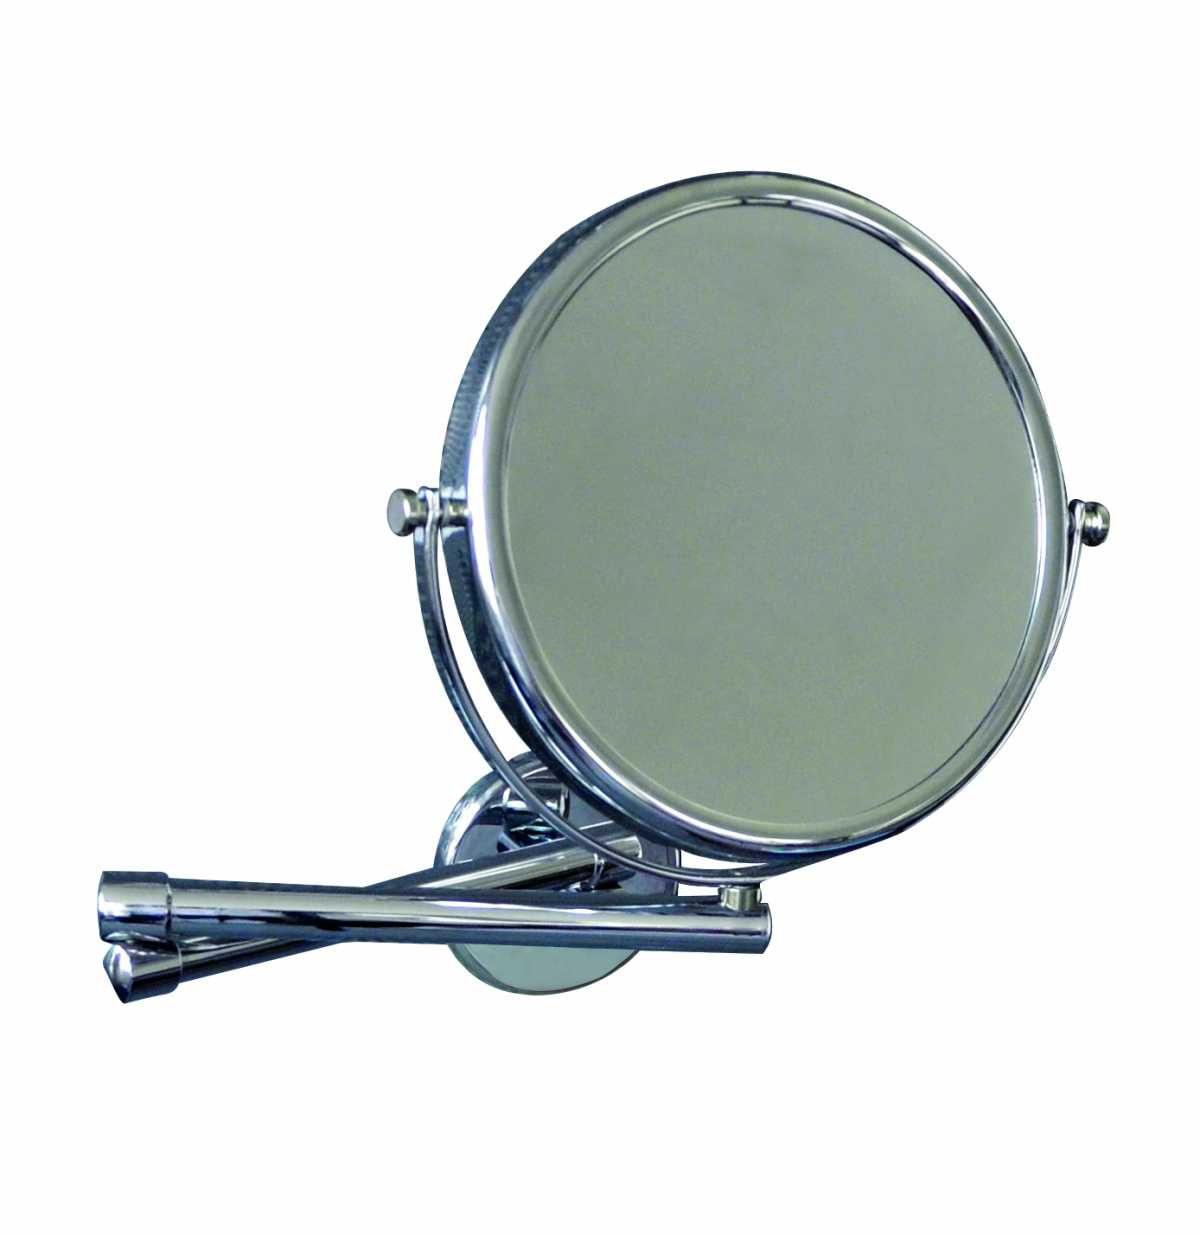 STARMIX MS 23 U Krom Tıraş ve Makyaj Aynası